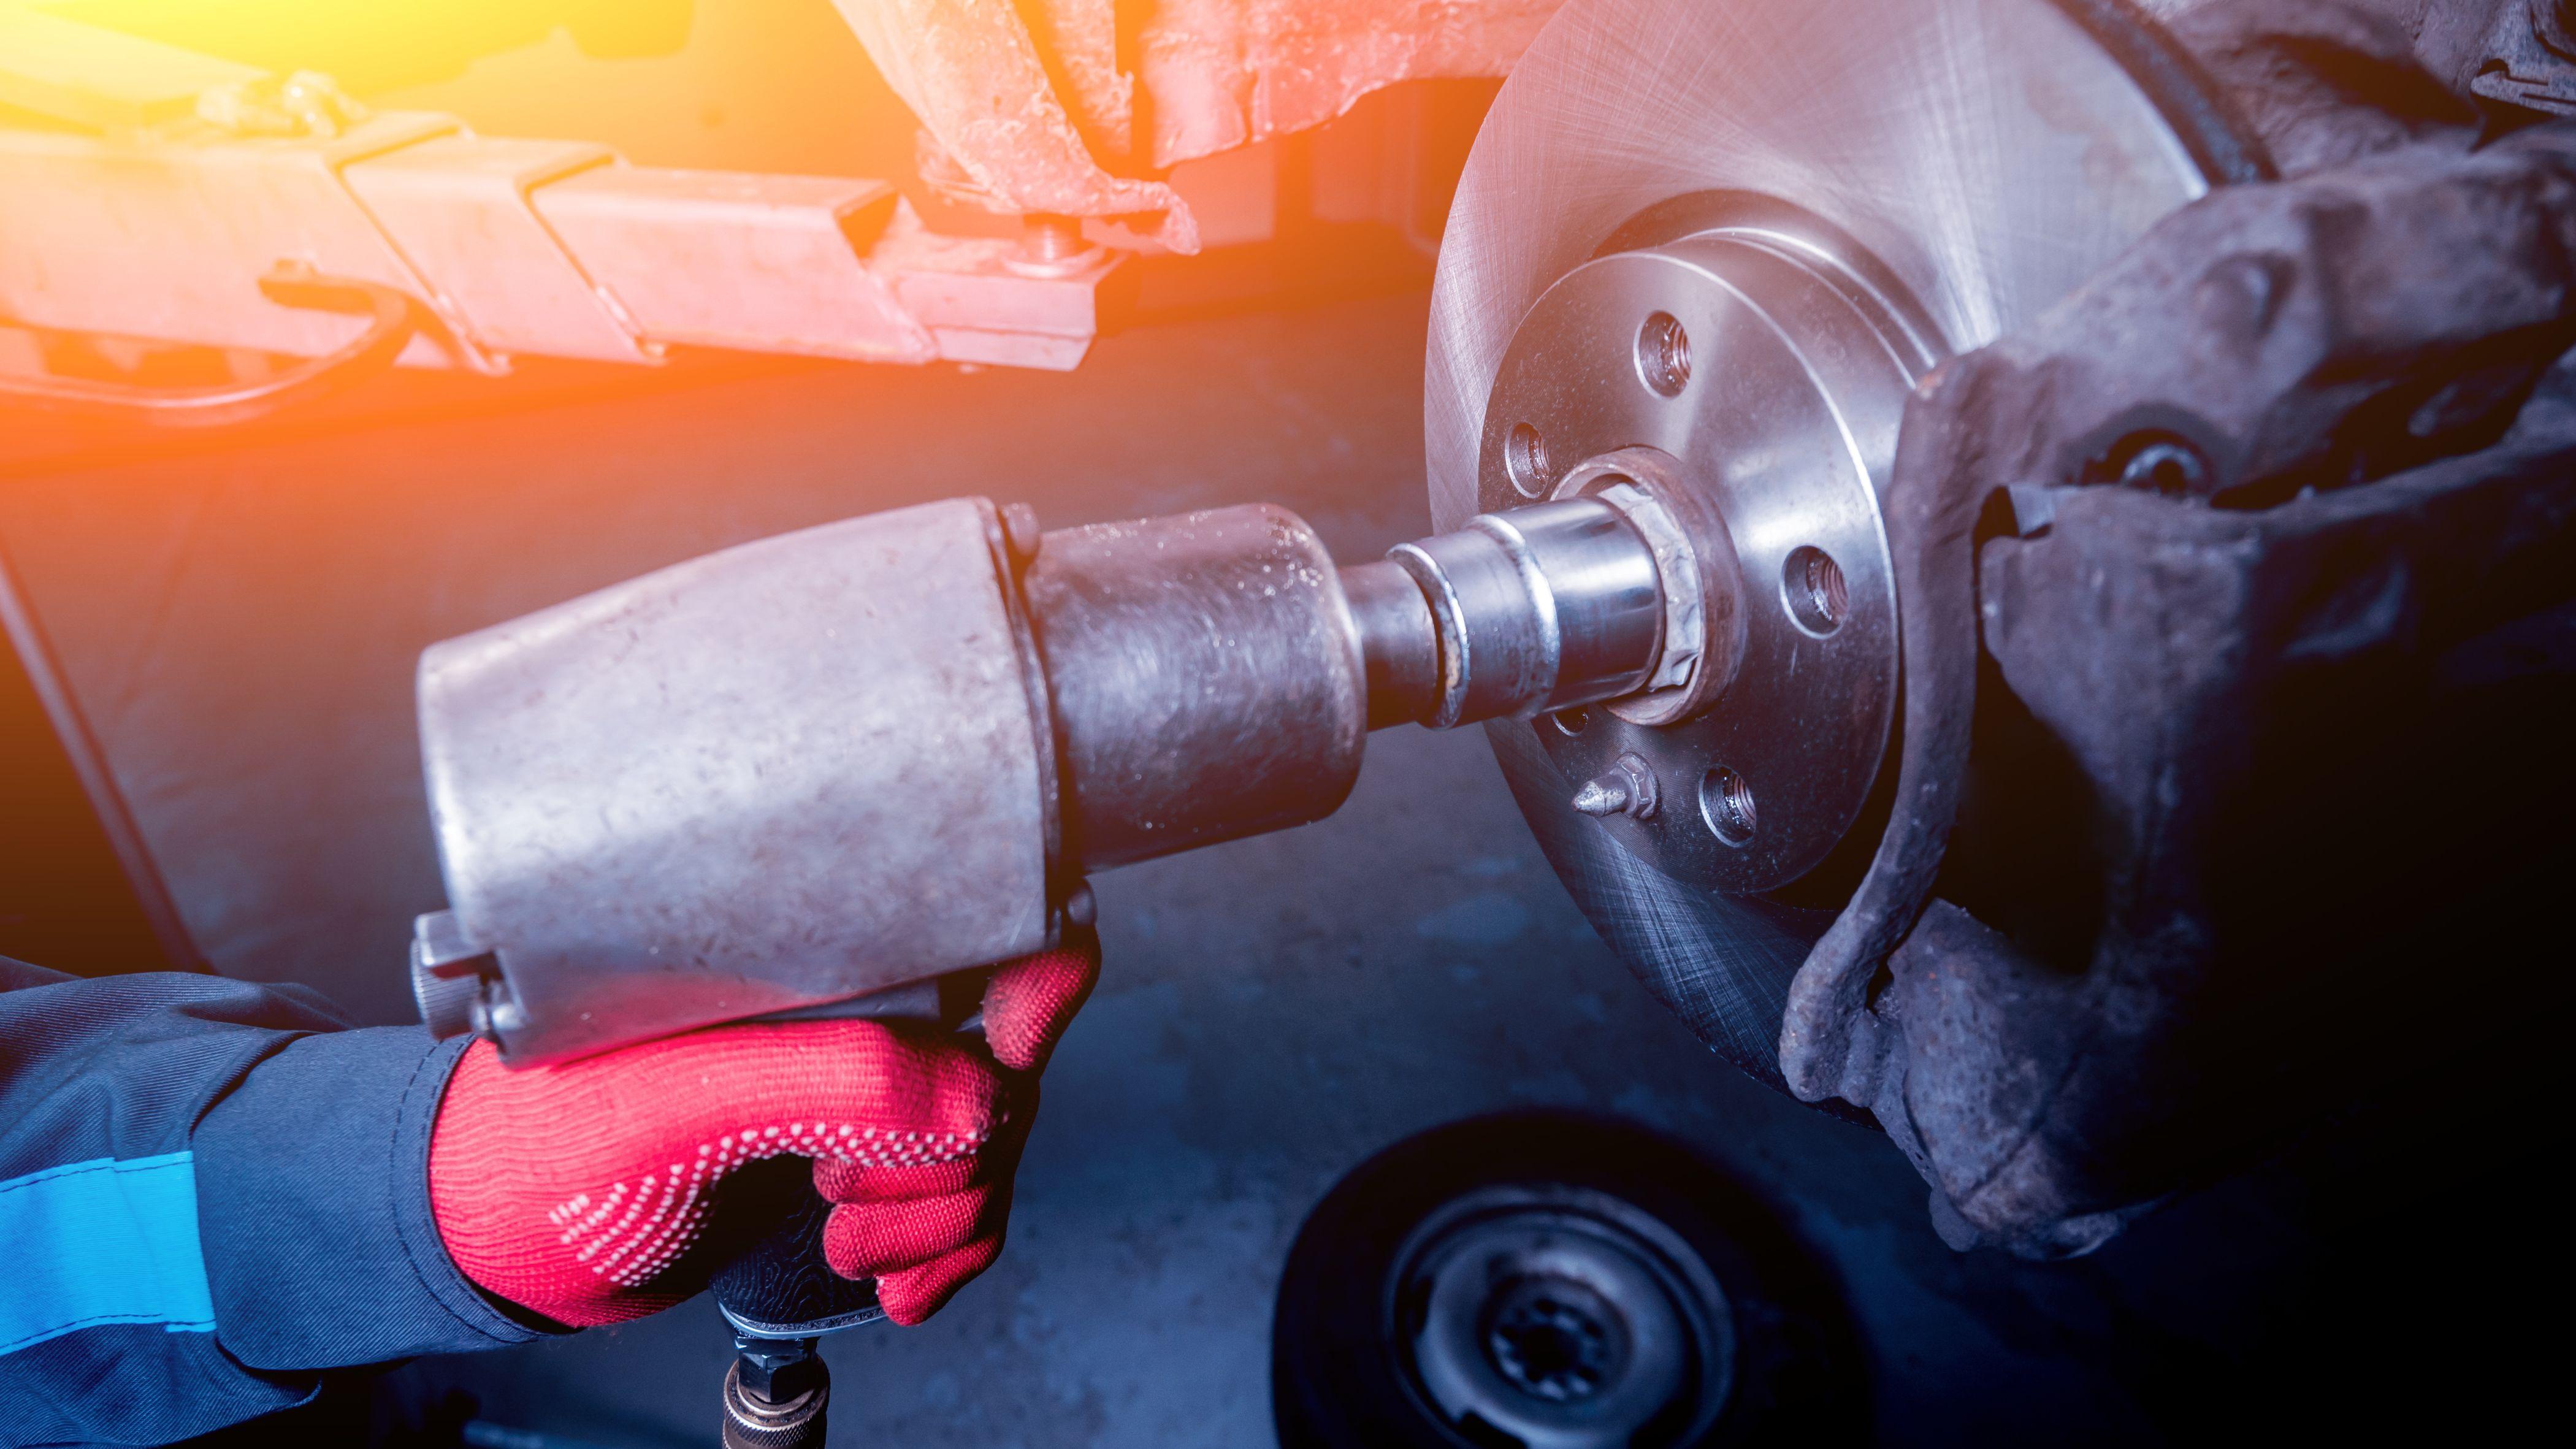 Pneumatic impact wrench buying guide